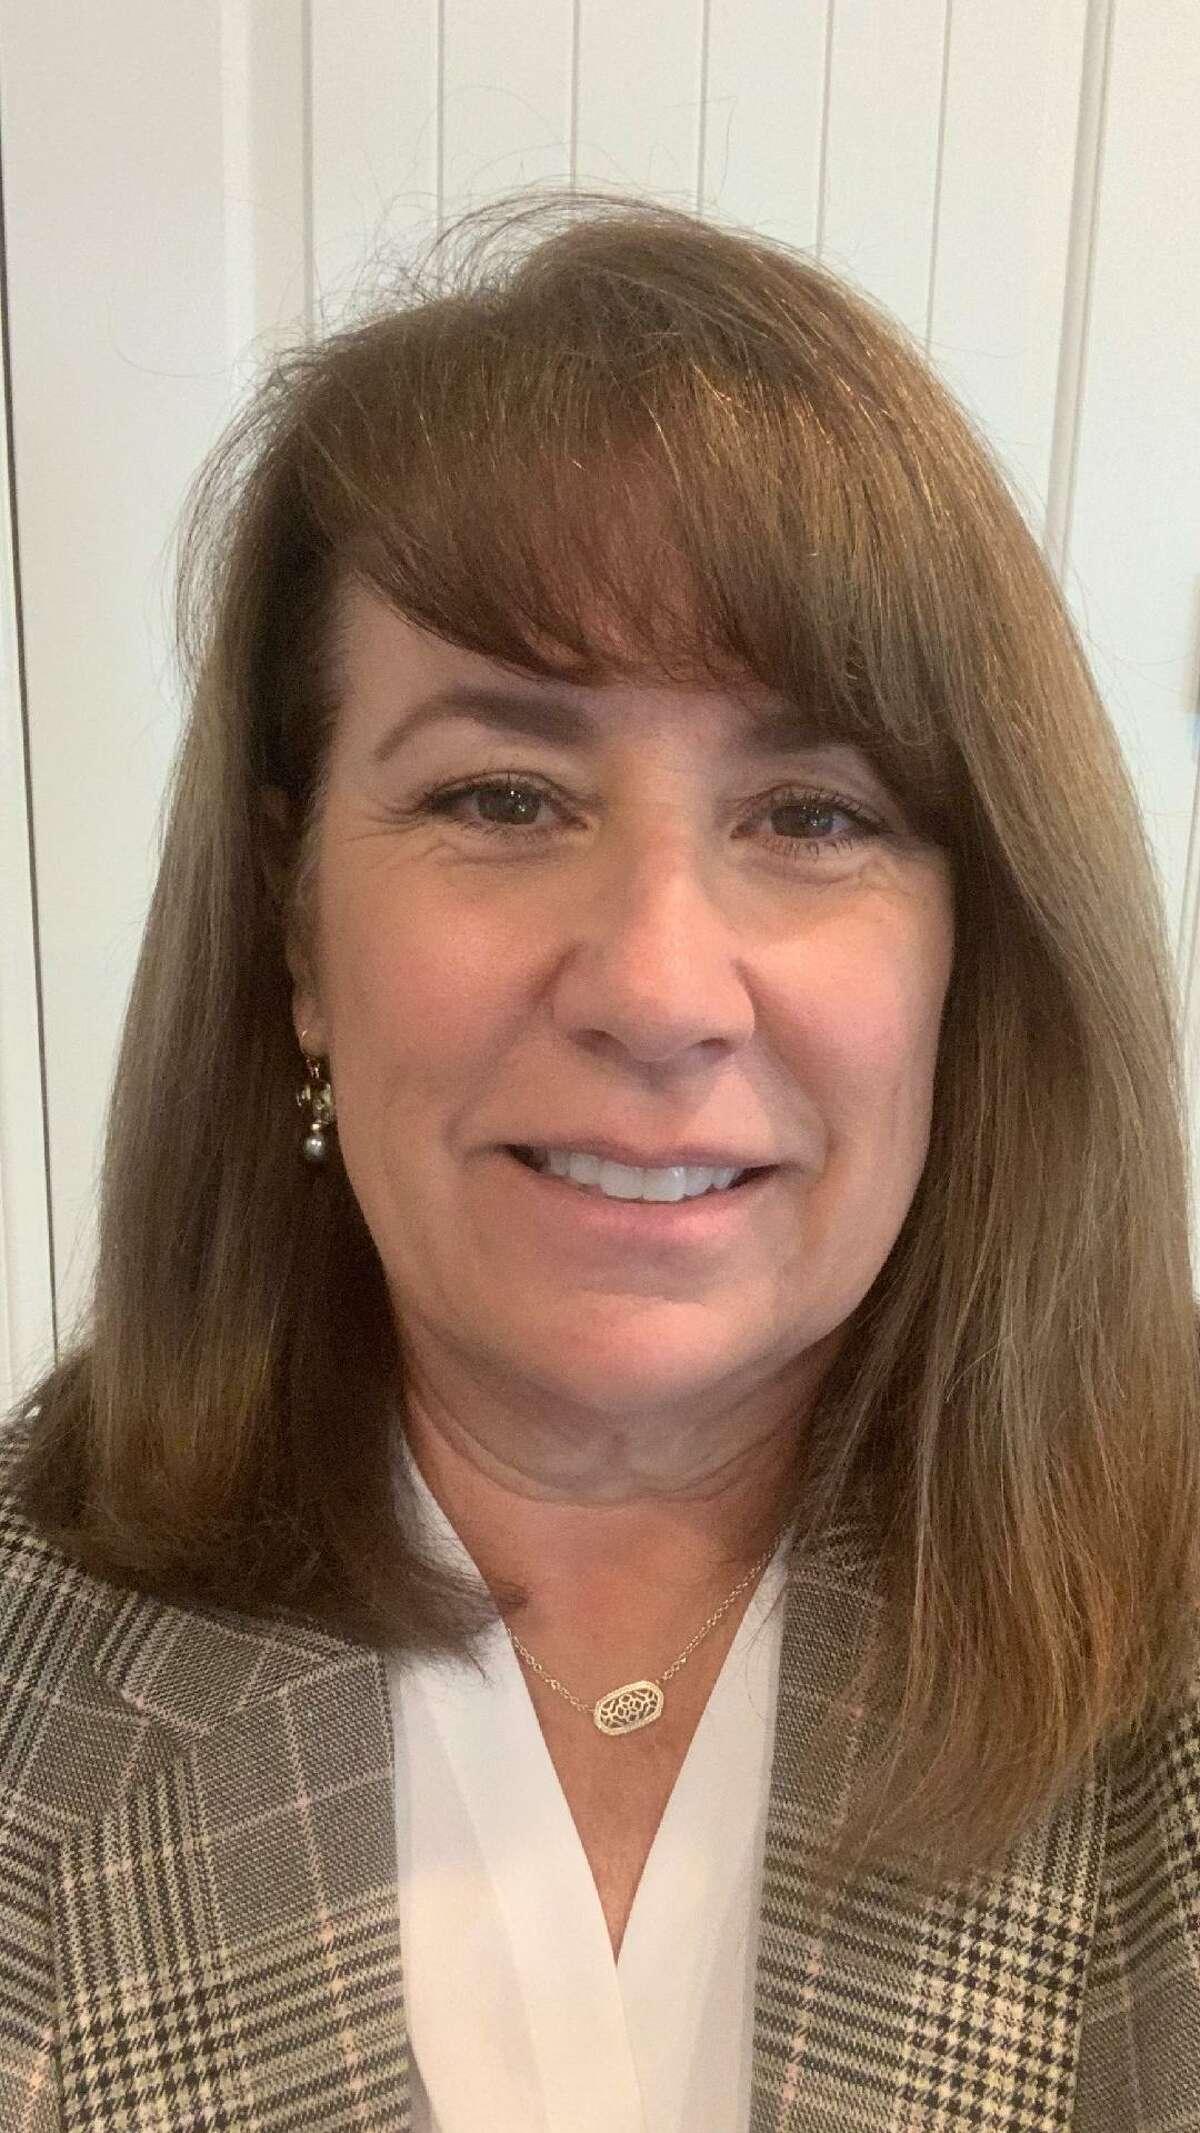 Denise Miner - Executive Director of Human Capital